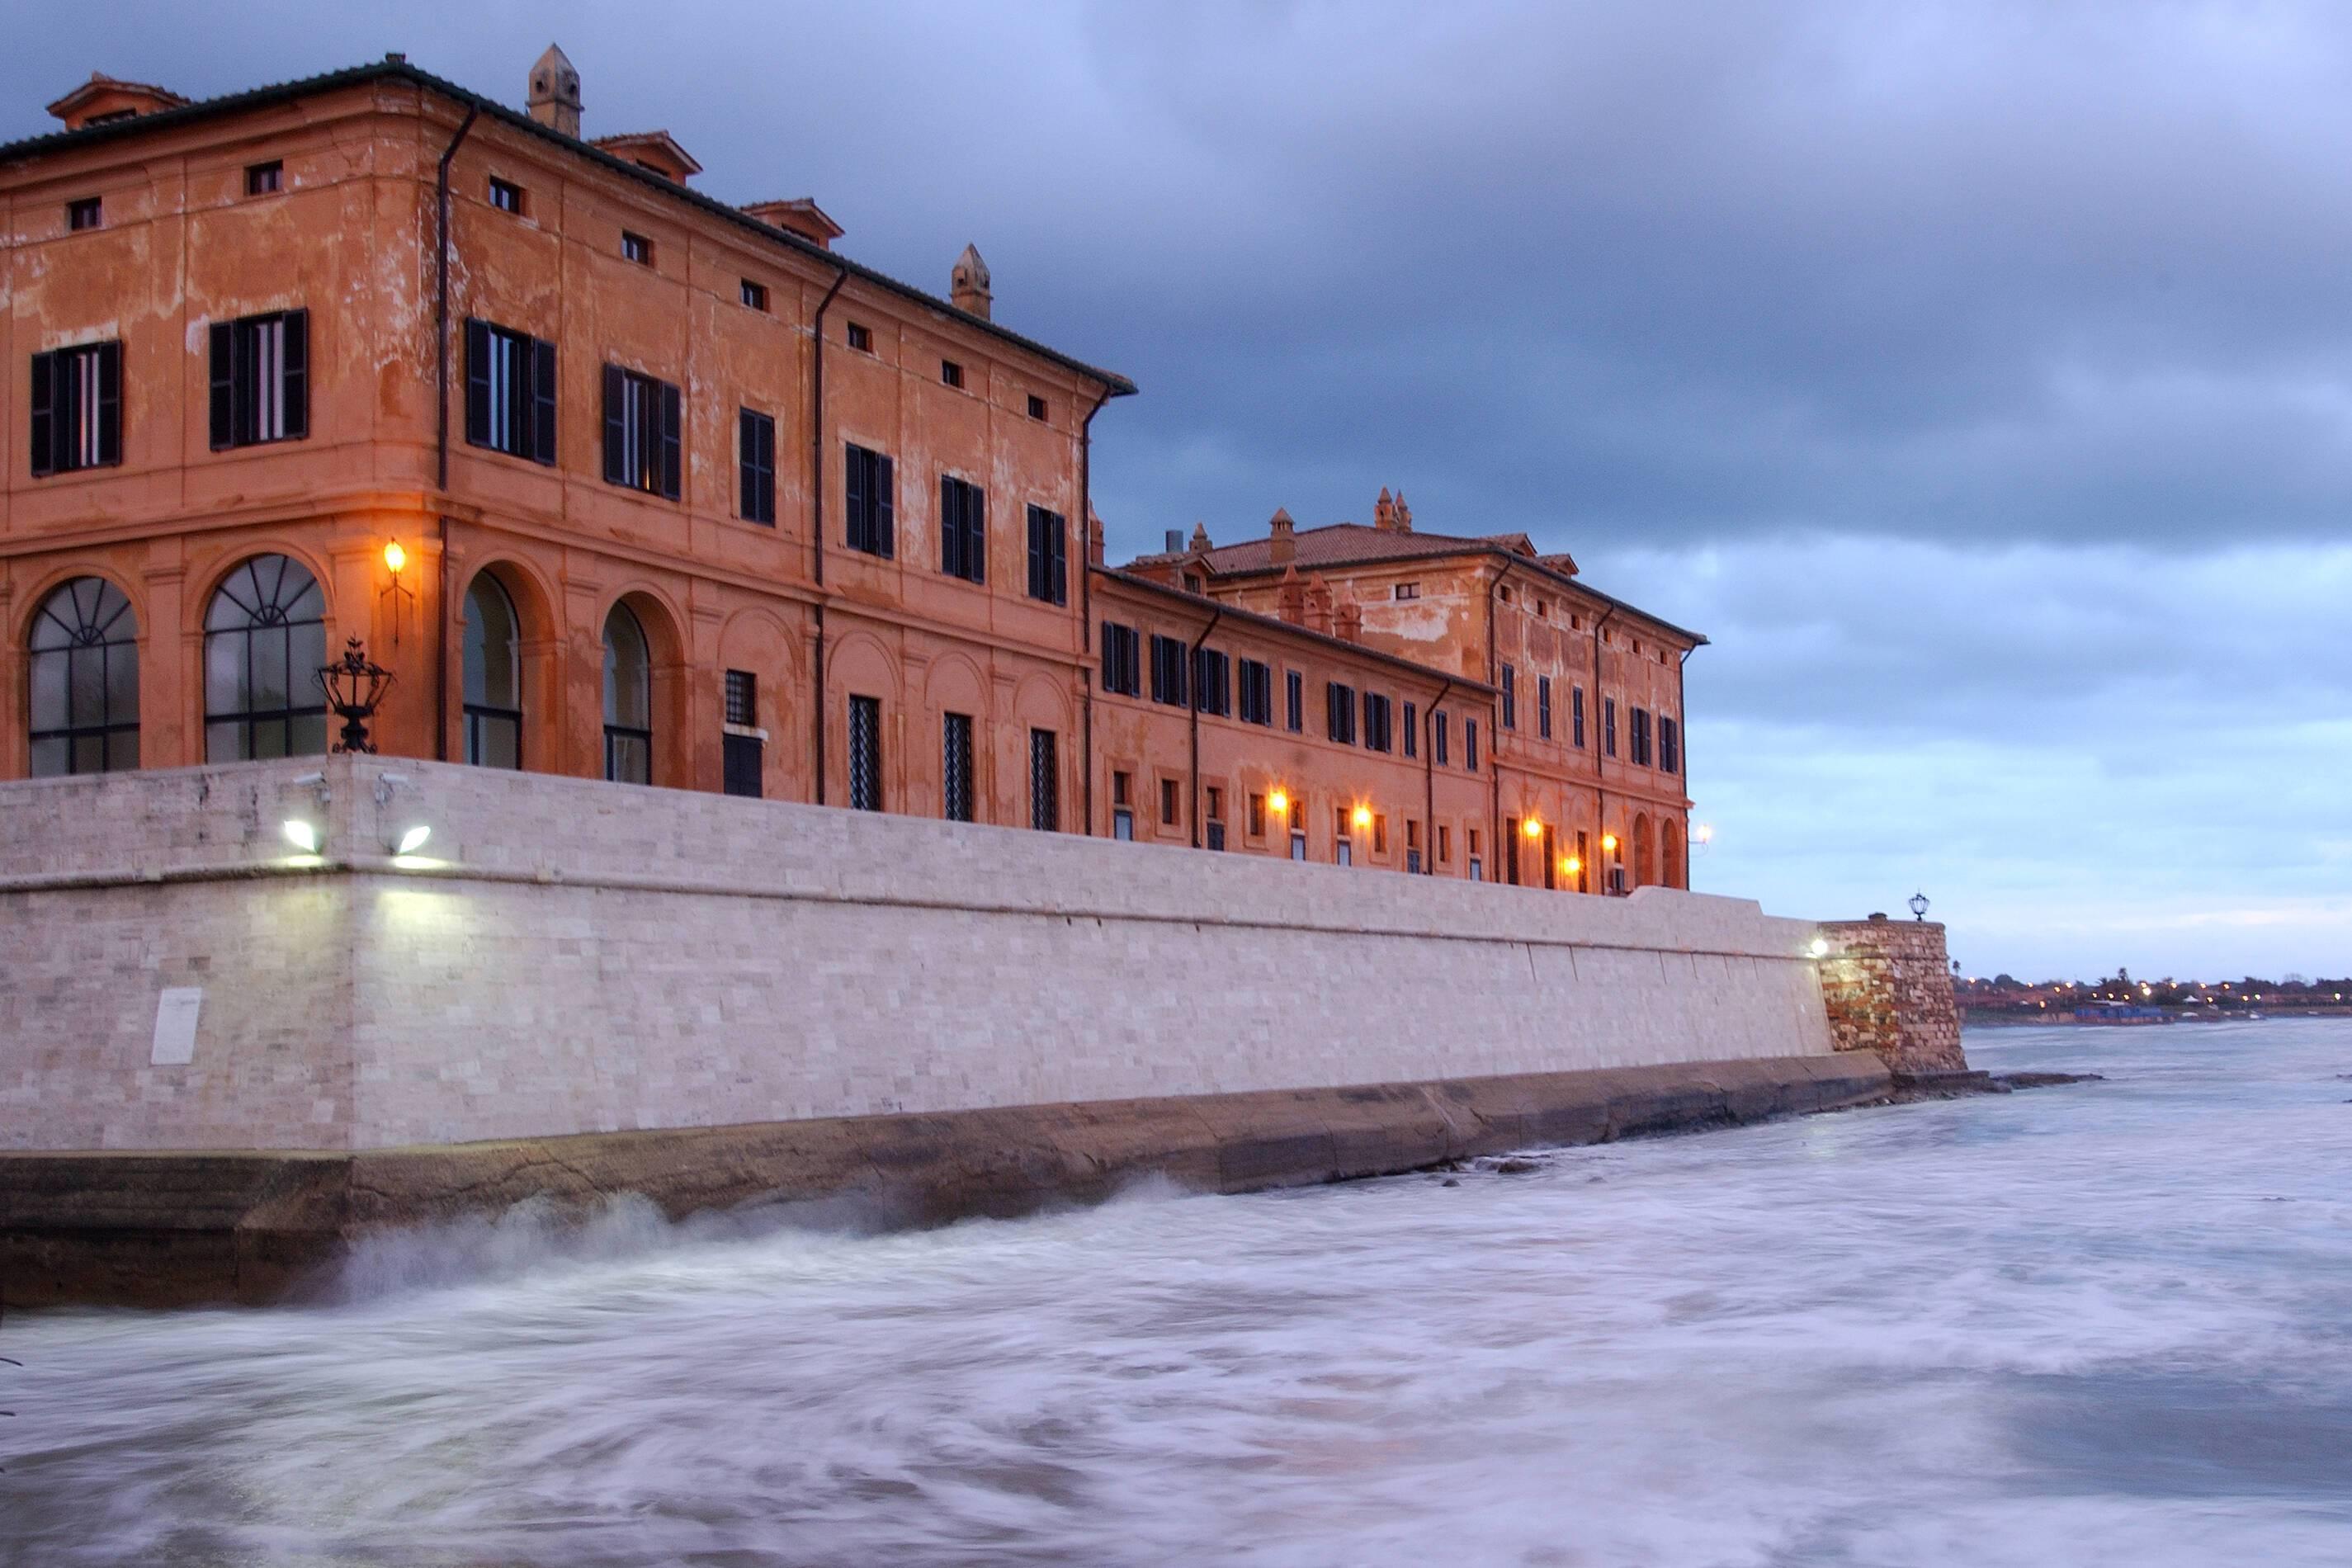 La Posta Vecchia Mer Rome